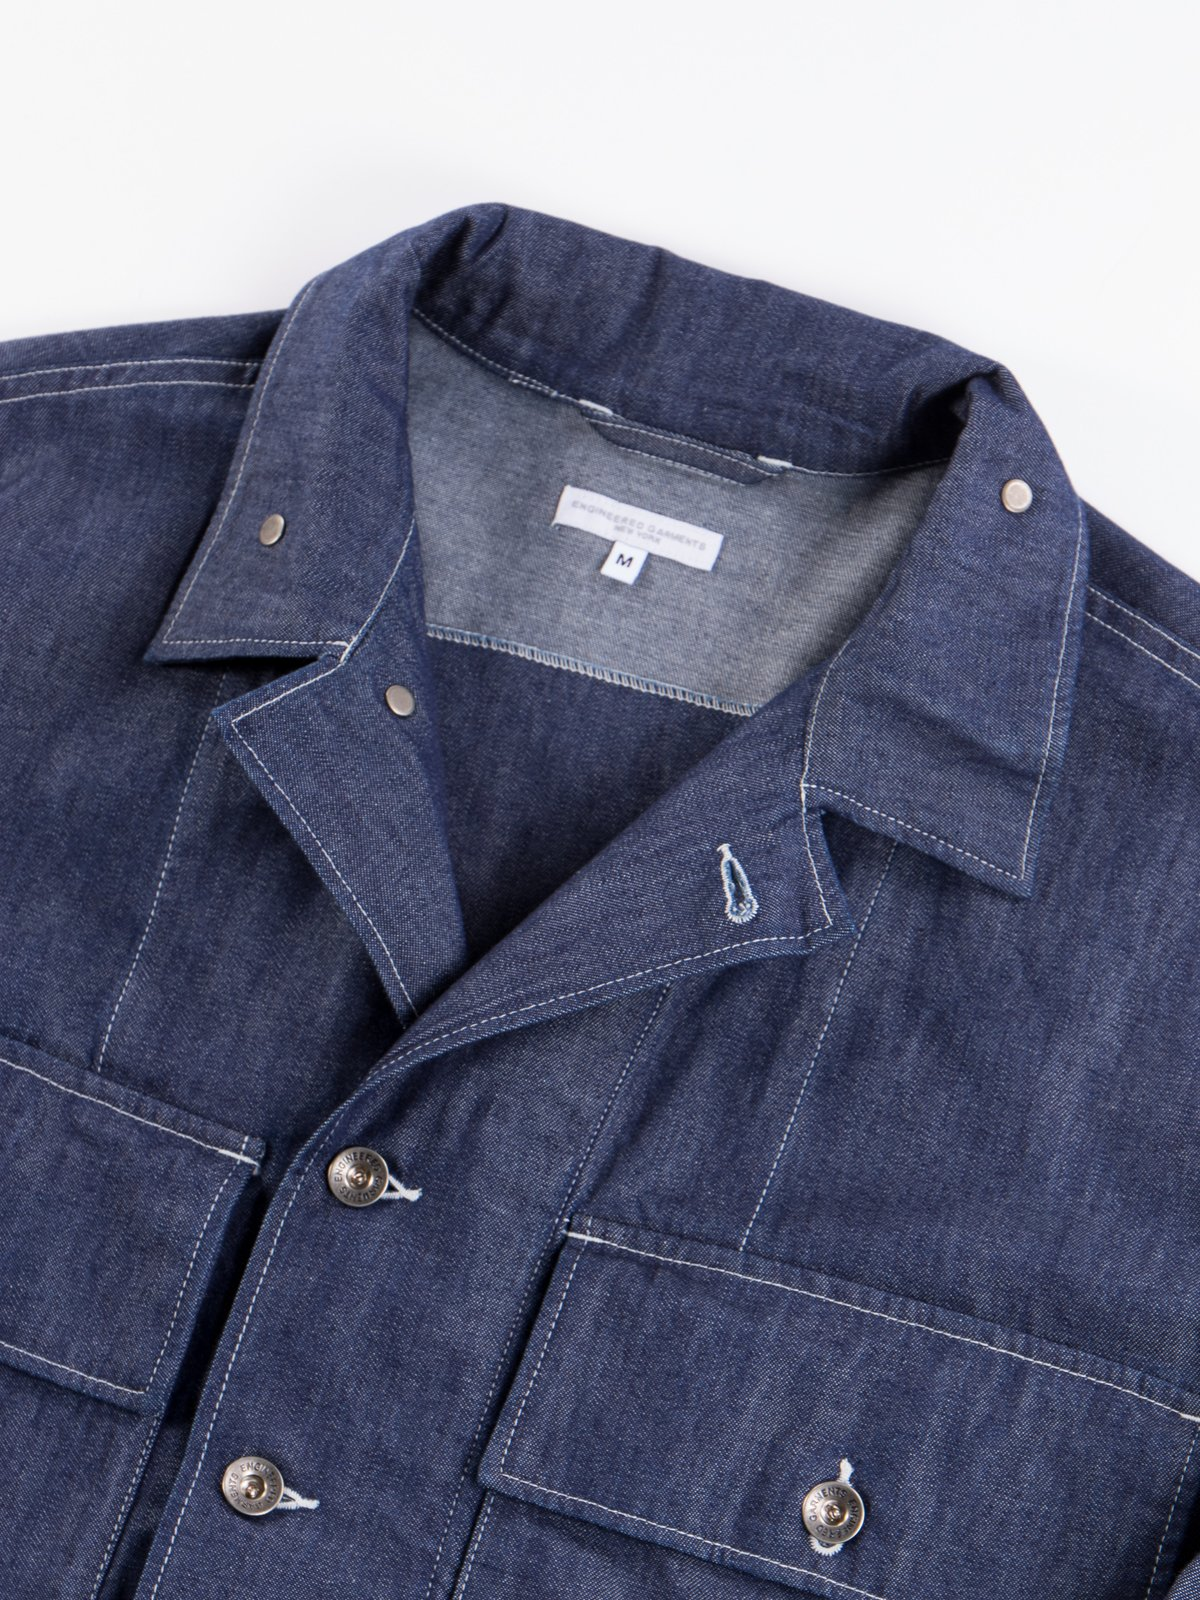 Indigo 8oz Cone Denim M43/2 Shirt Jacket - Image 7